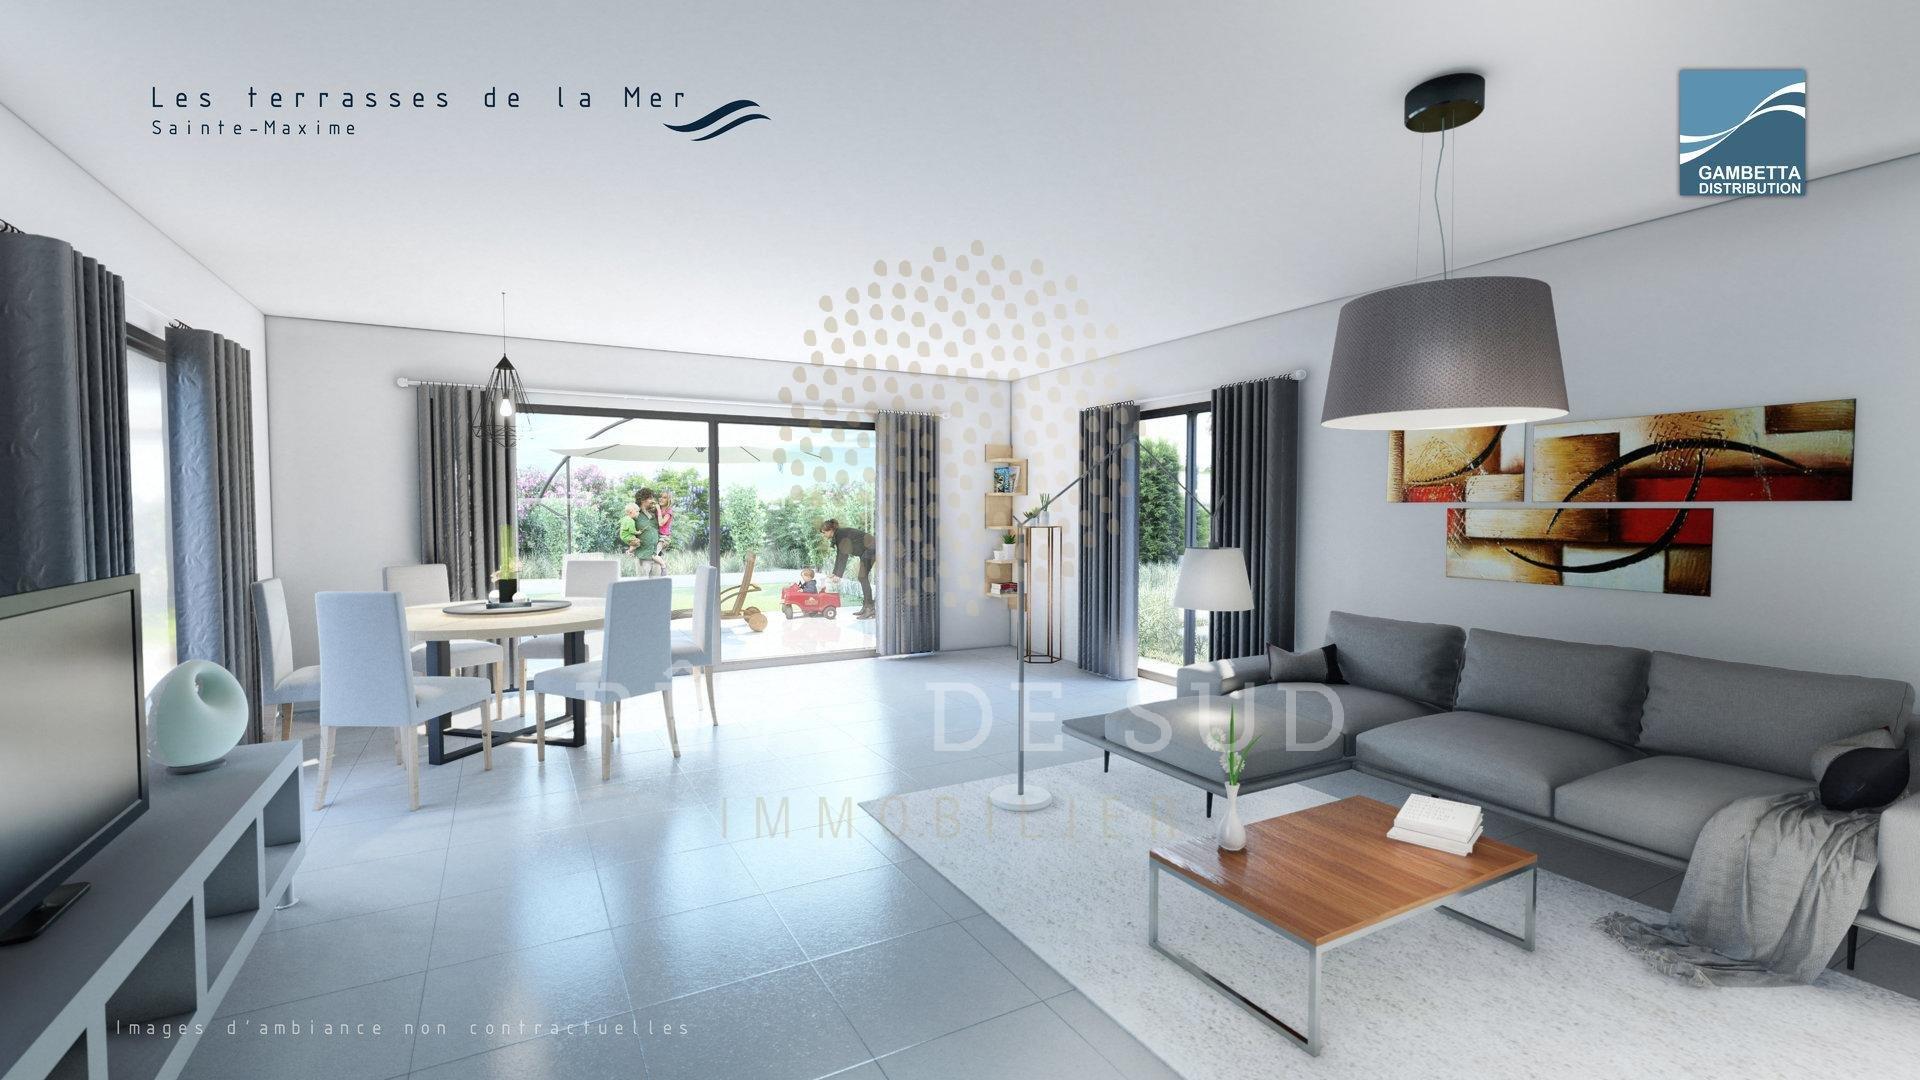 New type 4 apartment in SAINTE-MAXIME